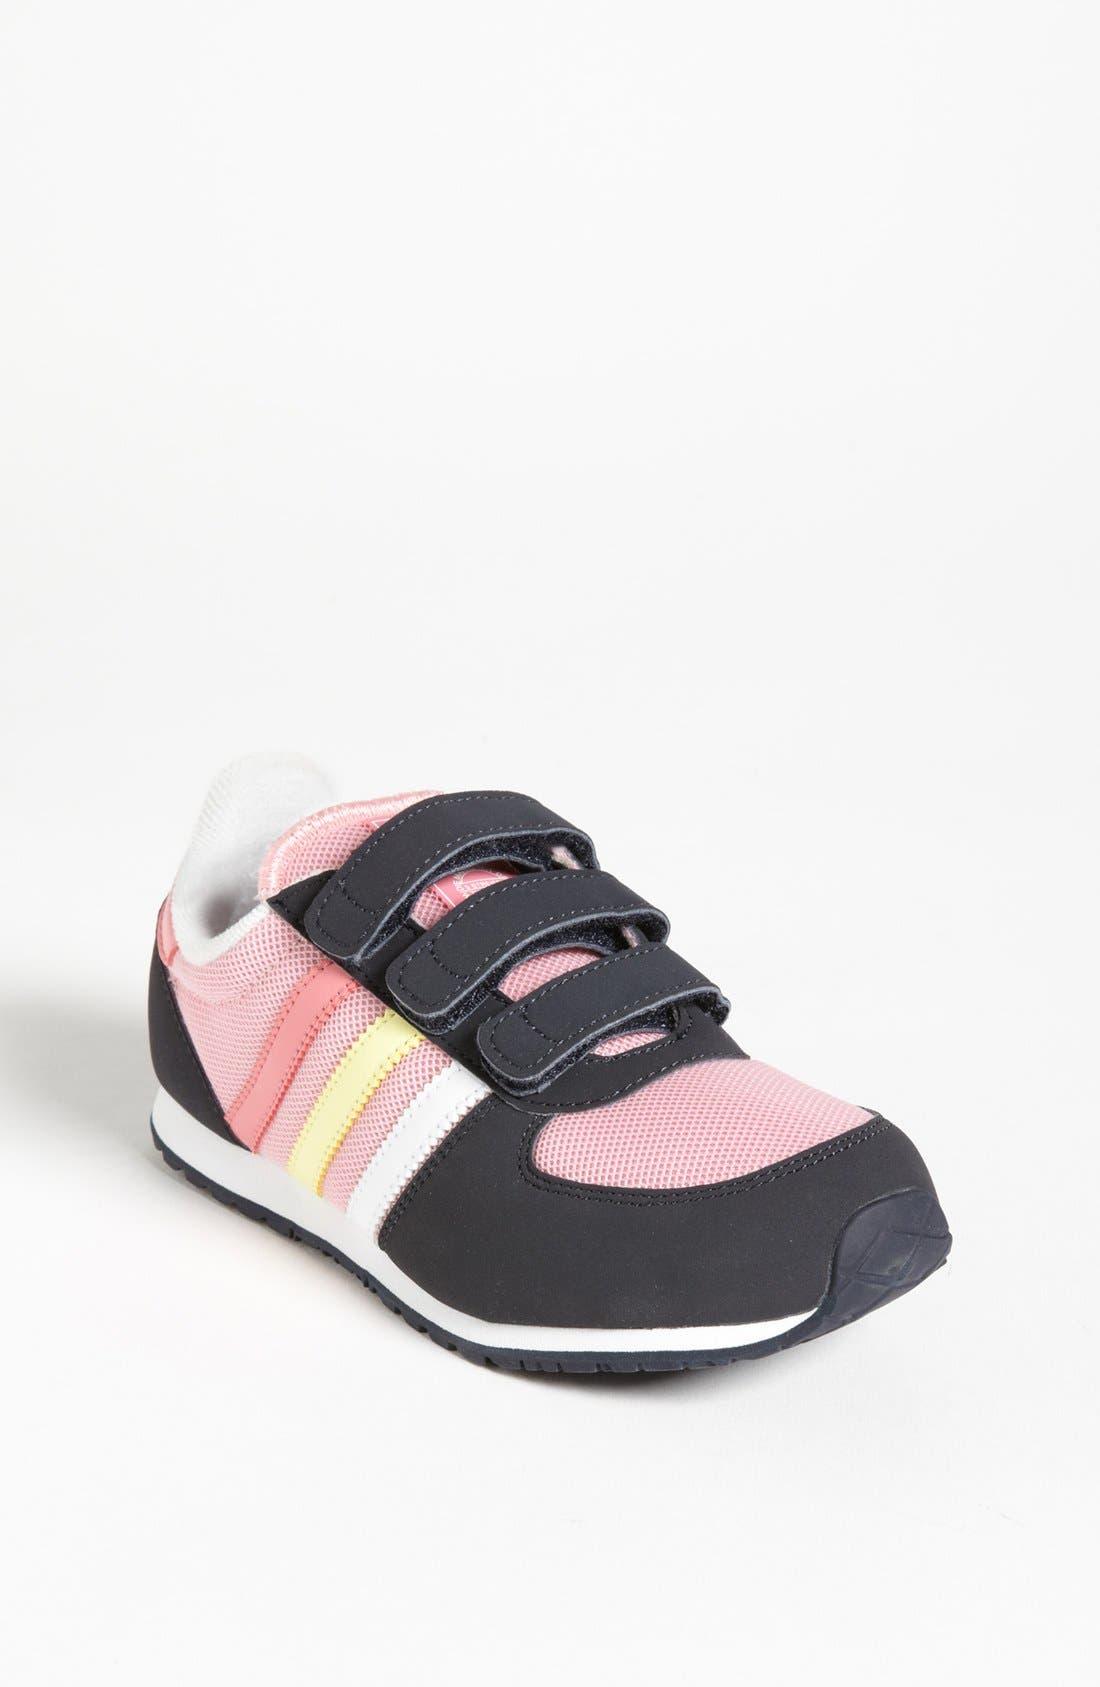 Alternate Image 1 Selected - adidas 'adistar Racer' Sneaker (Toddler & Little Kid)